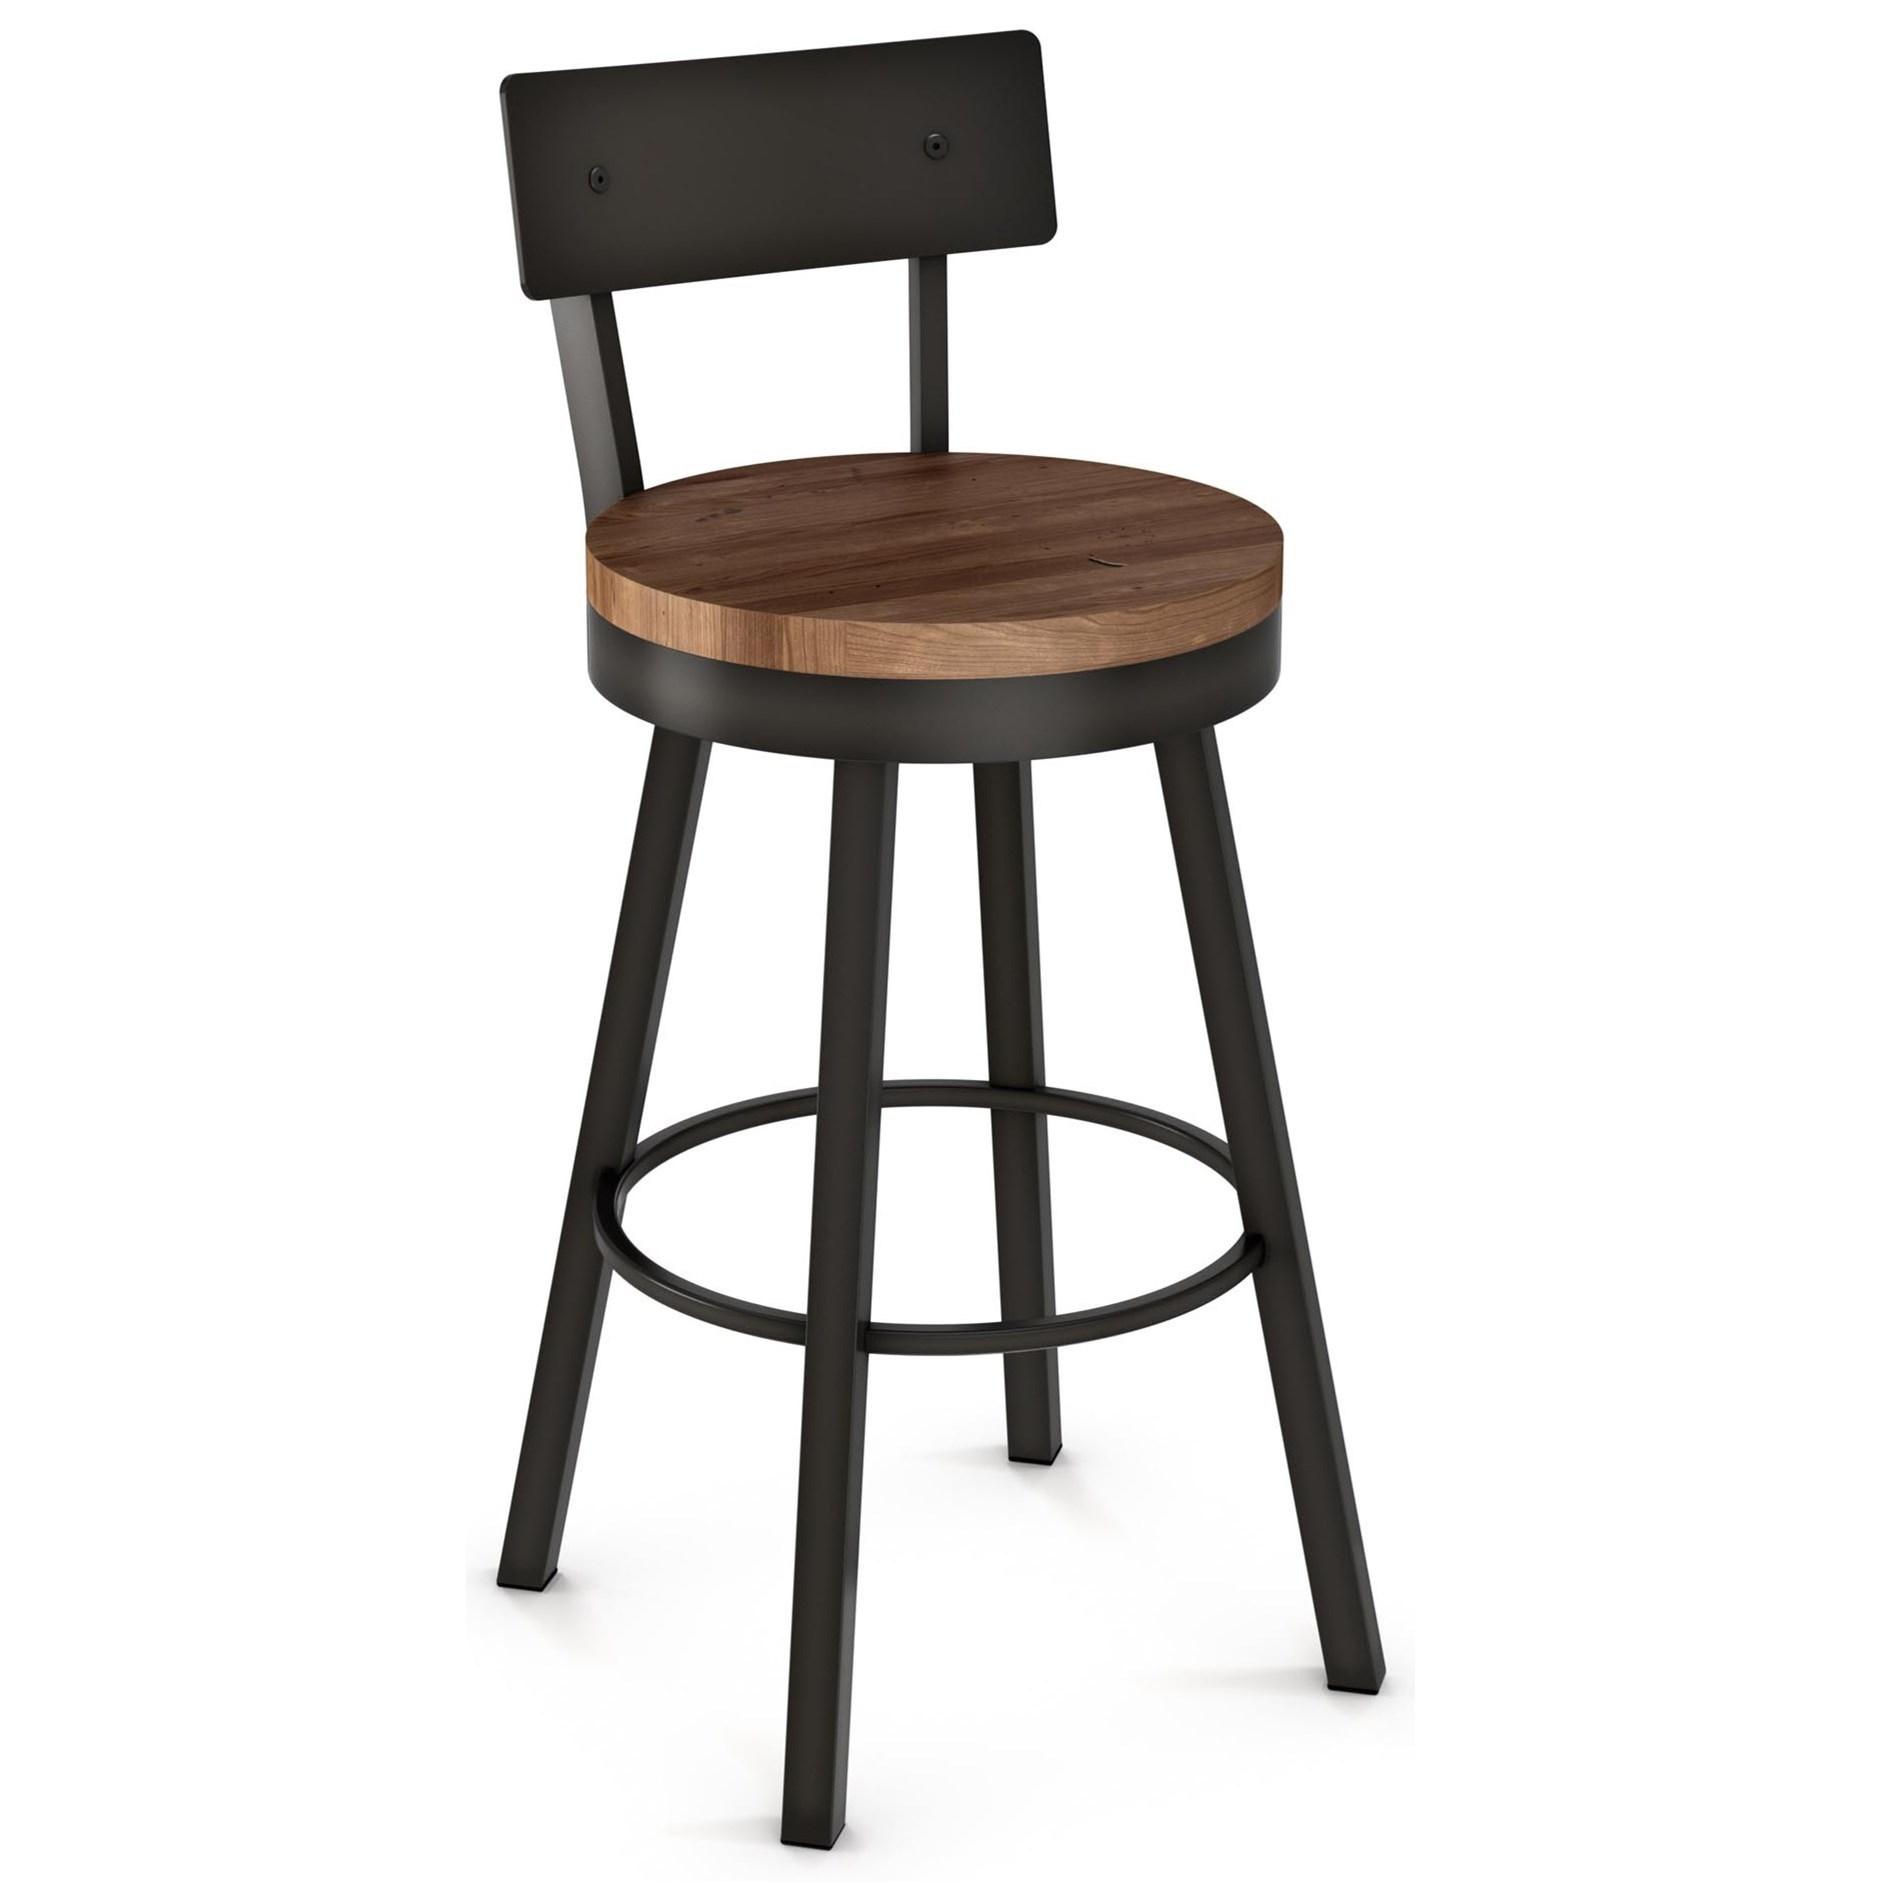 "Industrial 30"" Lauren Swivel Stool by Amisco at Saugerties Furniture Mart"